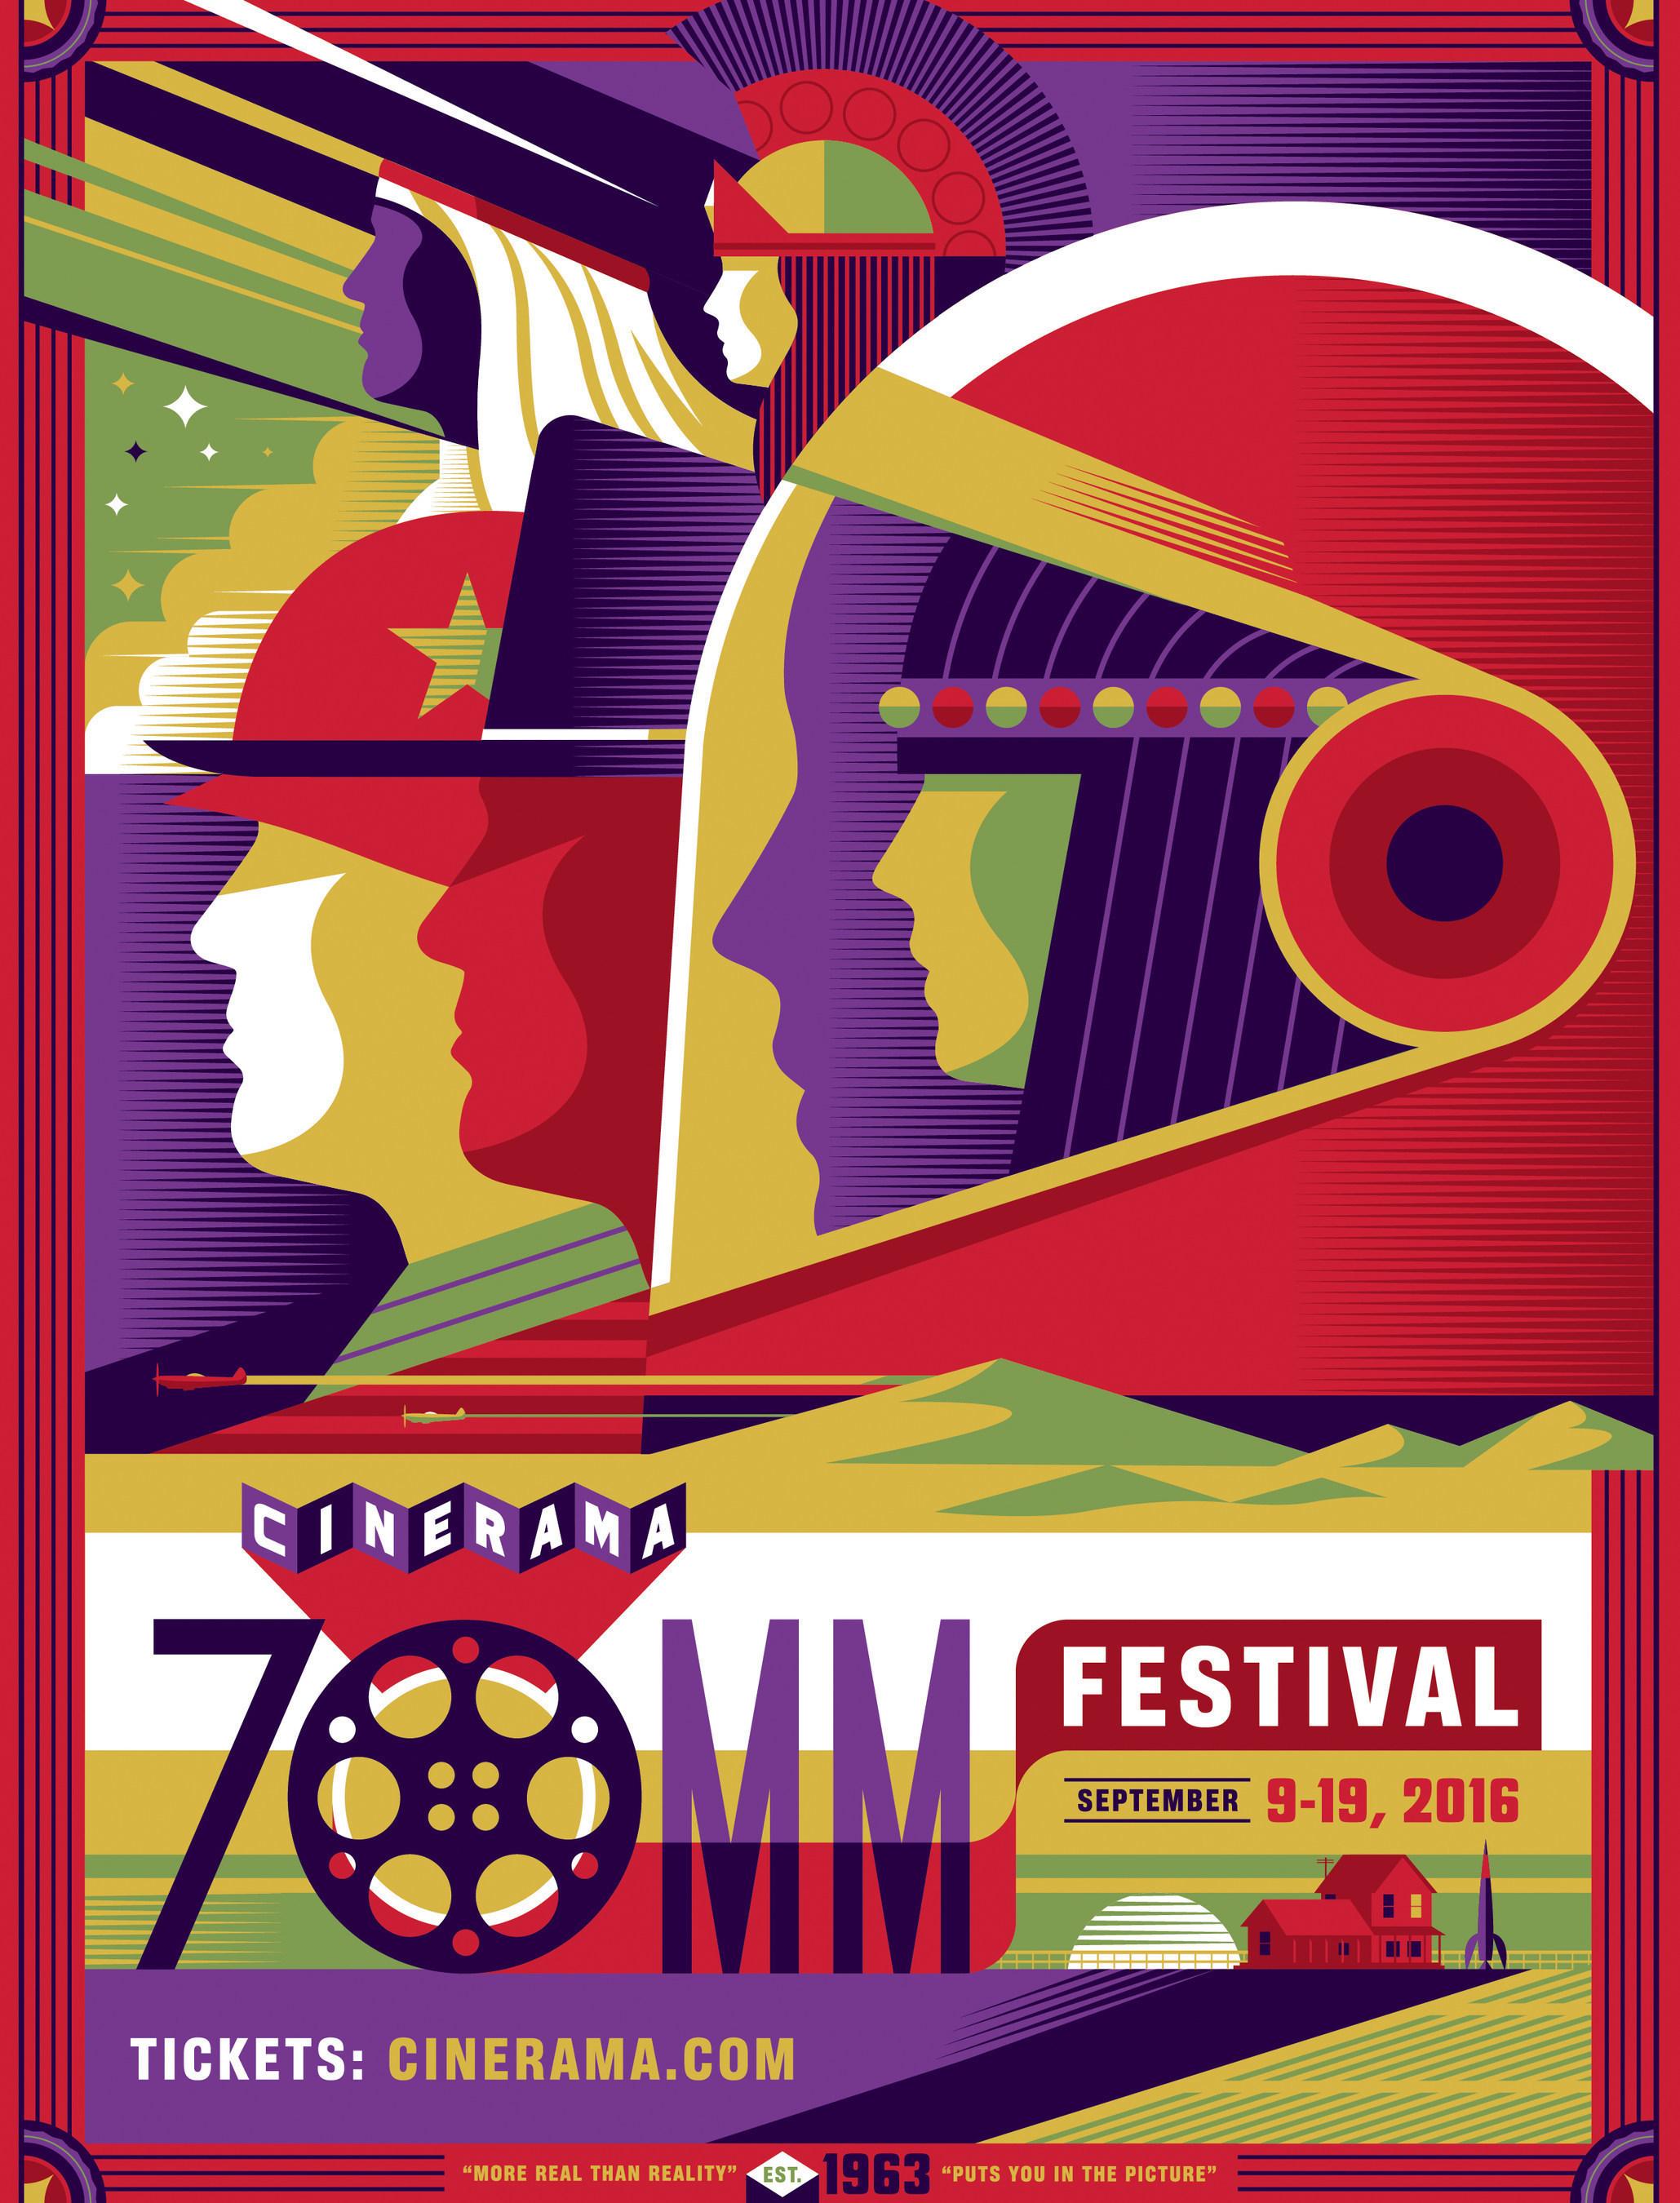 Seattle Cinerama Announces 70mm Film Festival, Beginning September 9